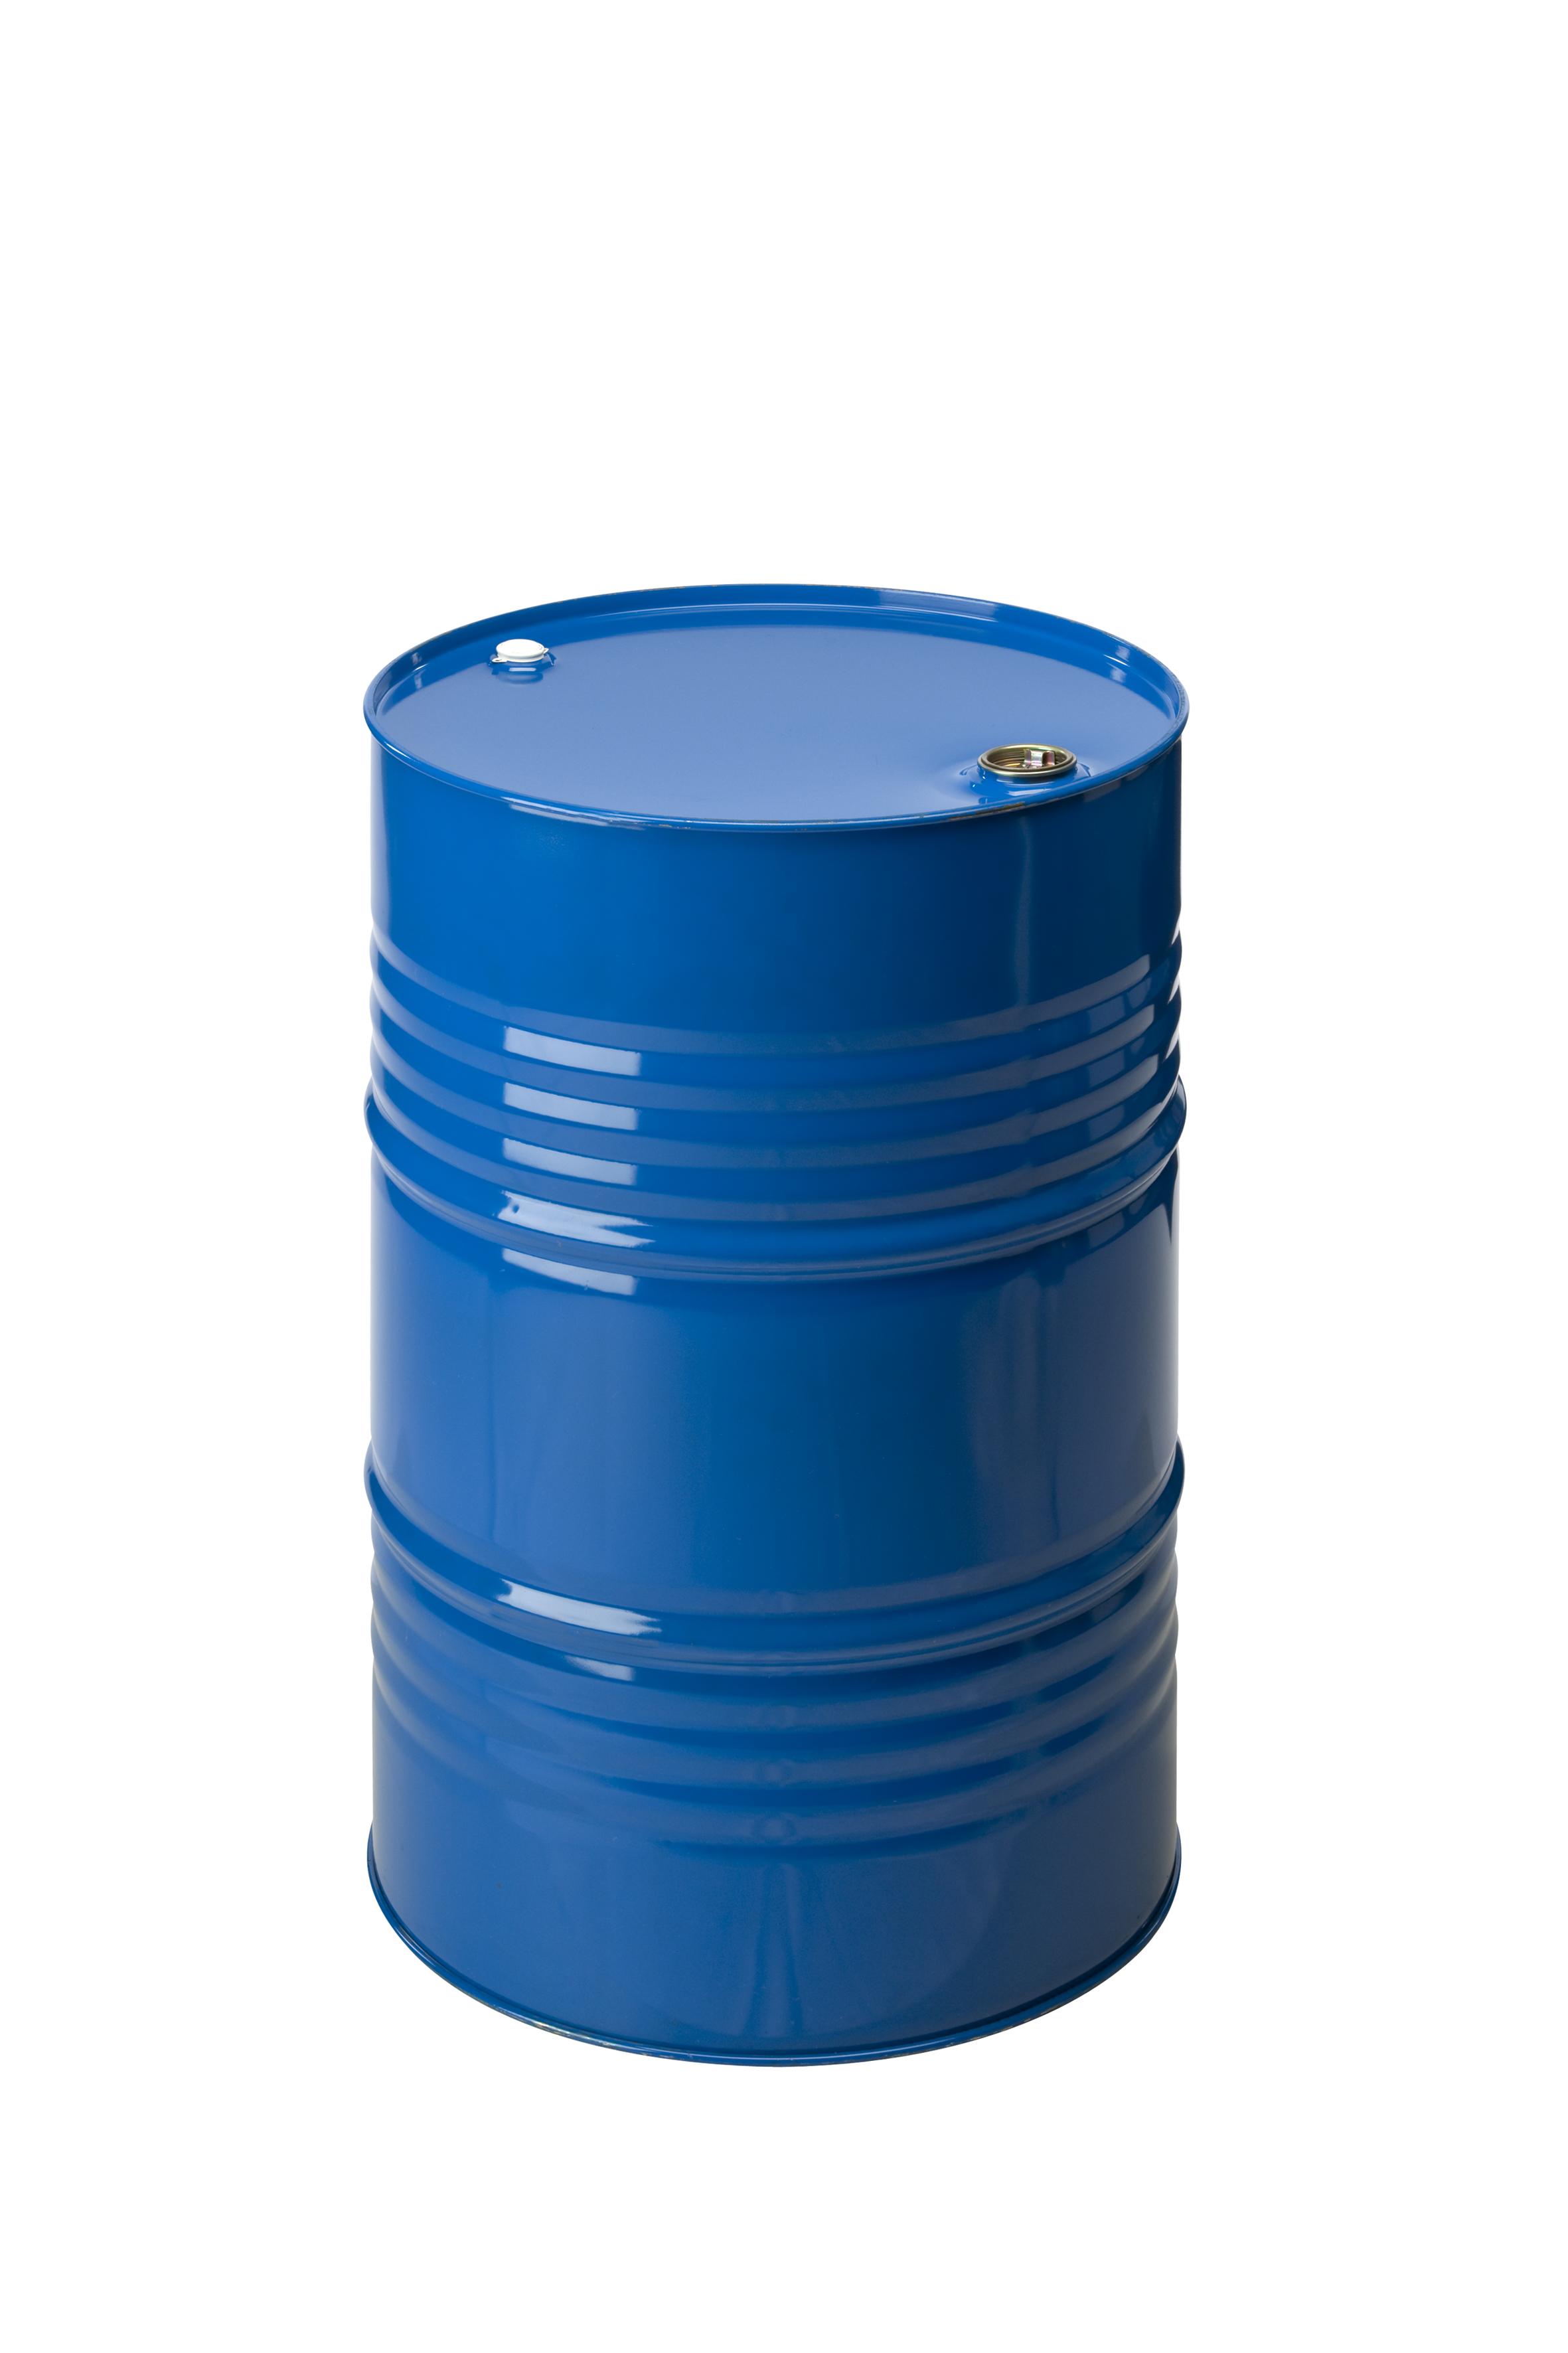 Vat 100 liter